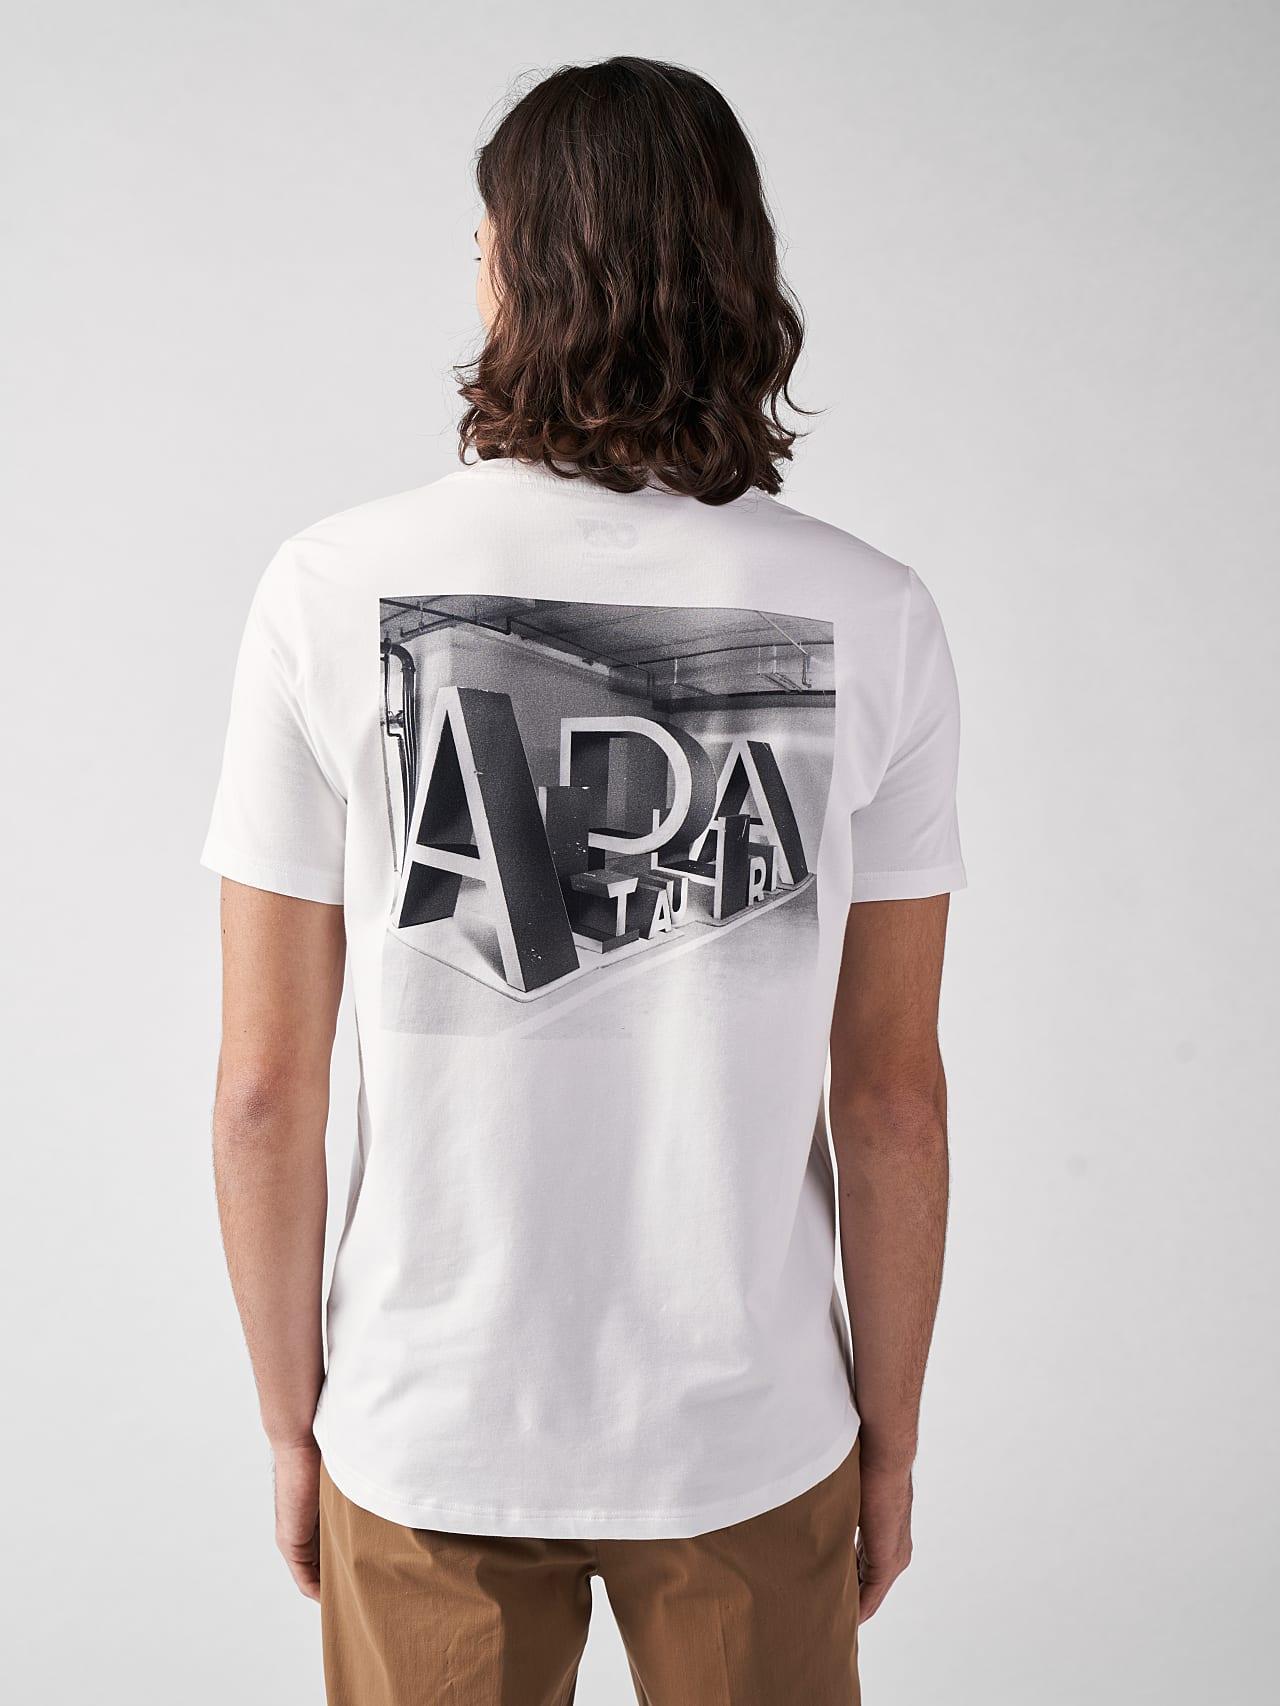 JALIP V1.Y5.01 Cotton Crew-Neck T-Shirt white Model shot Alpha Tauri